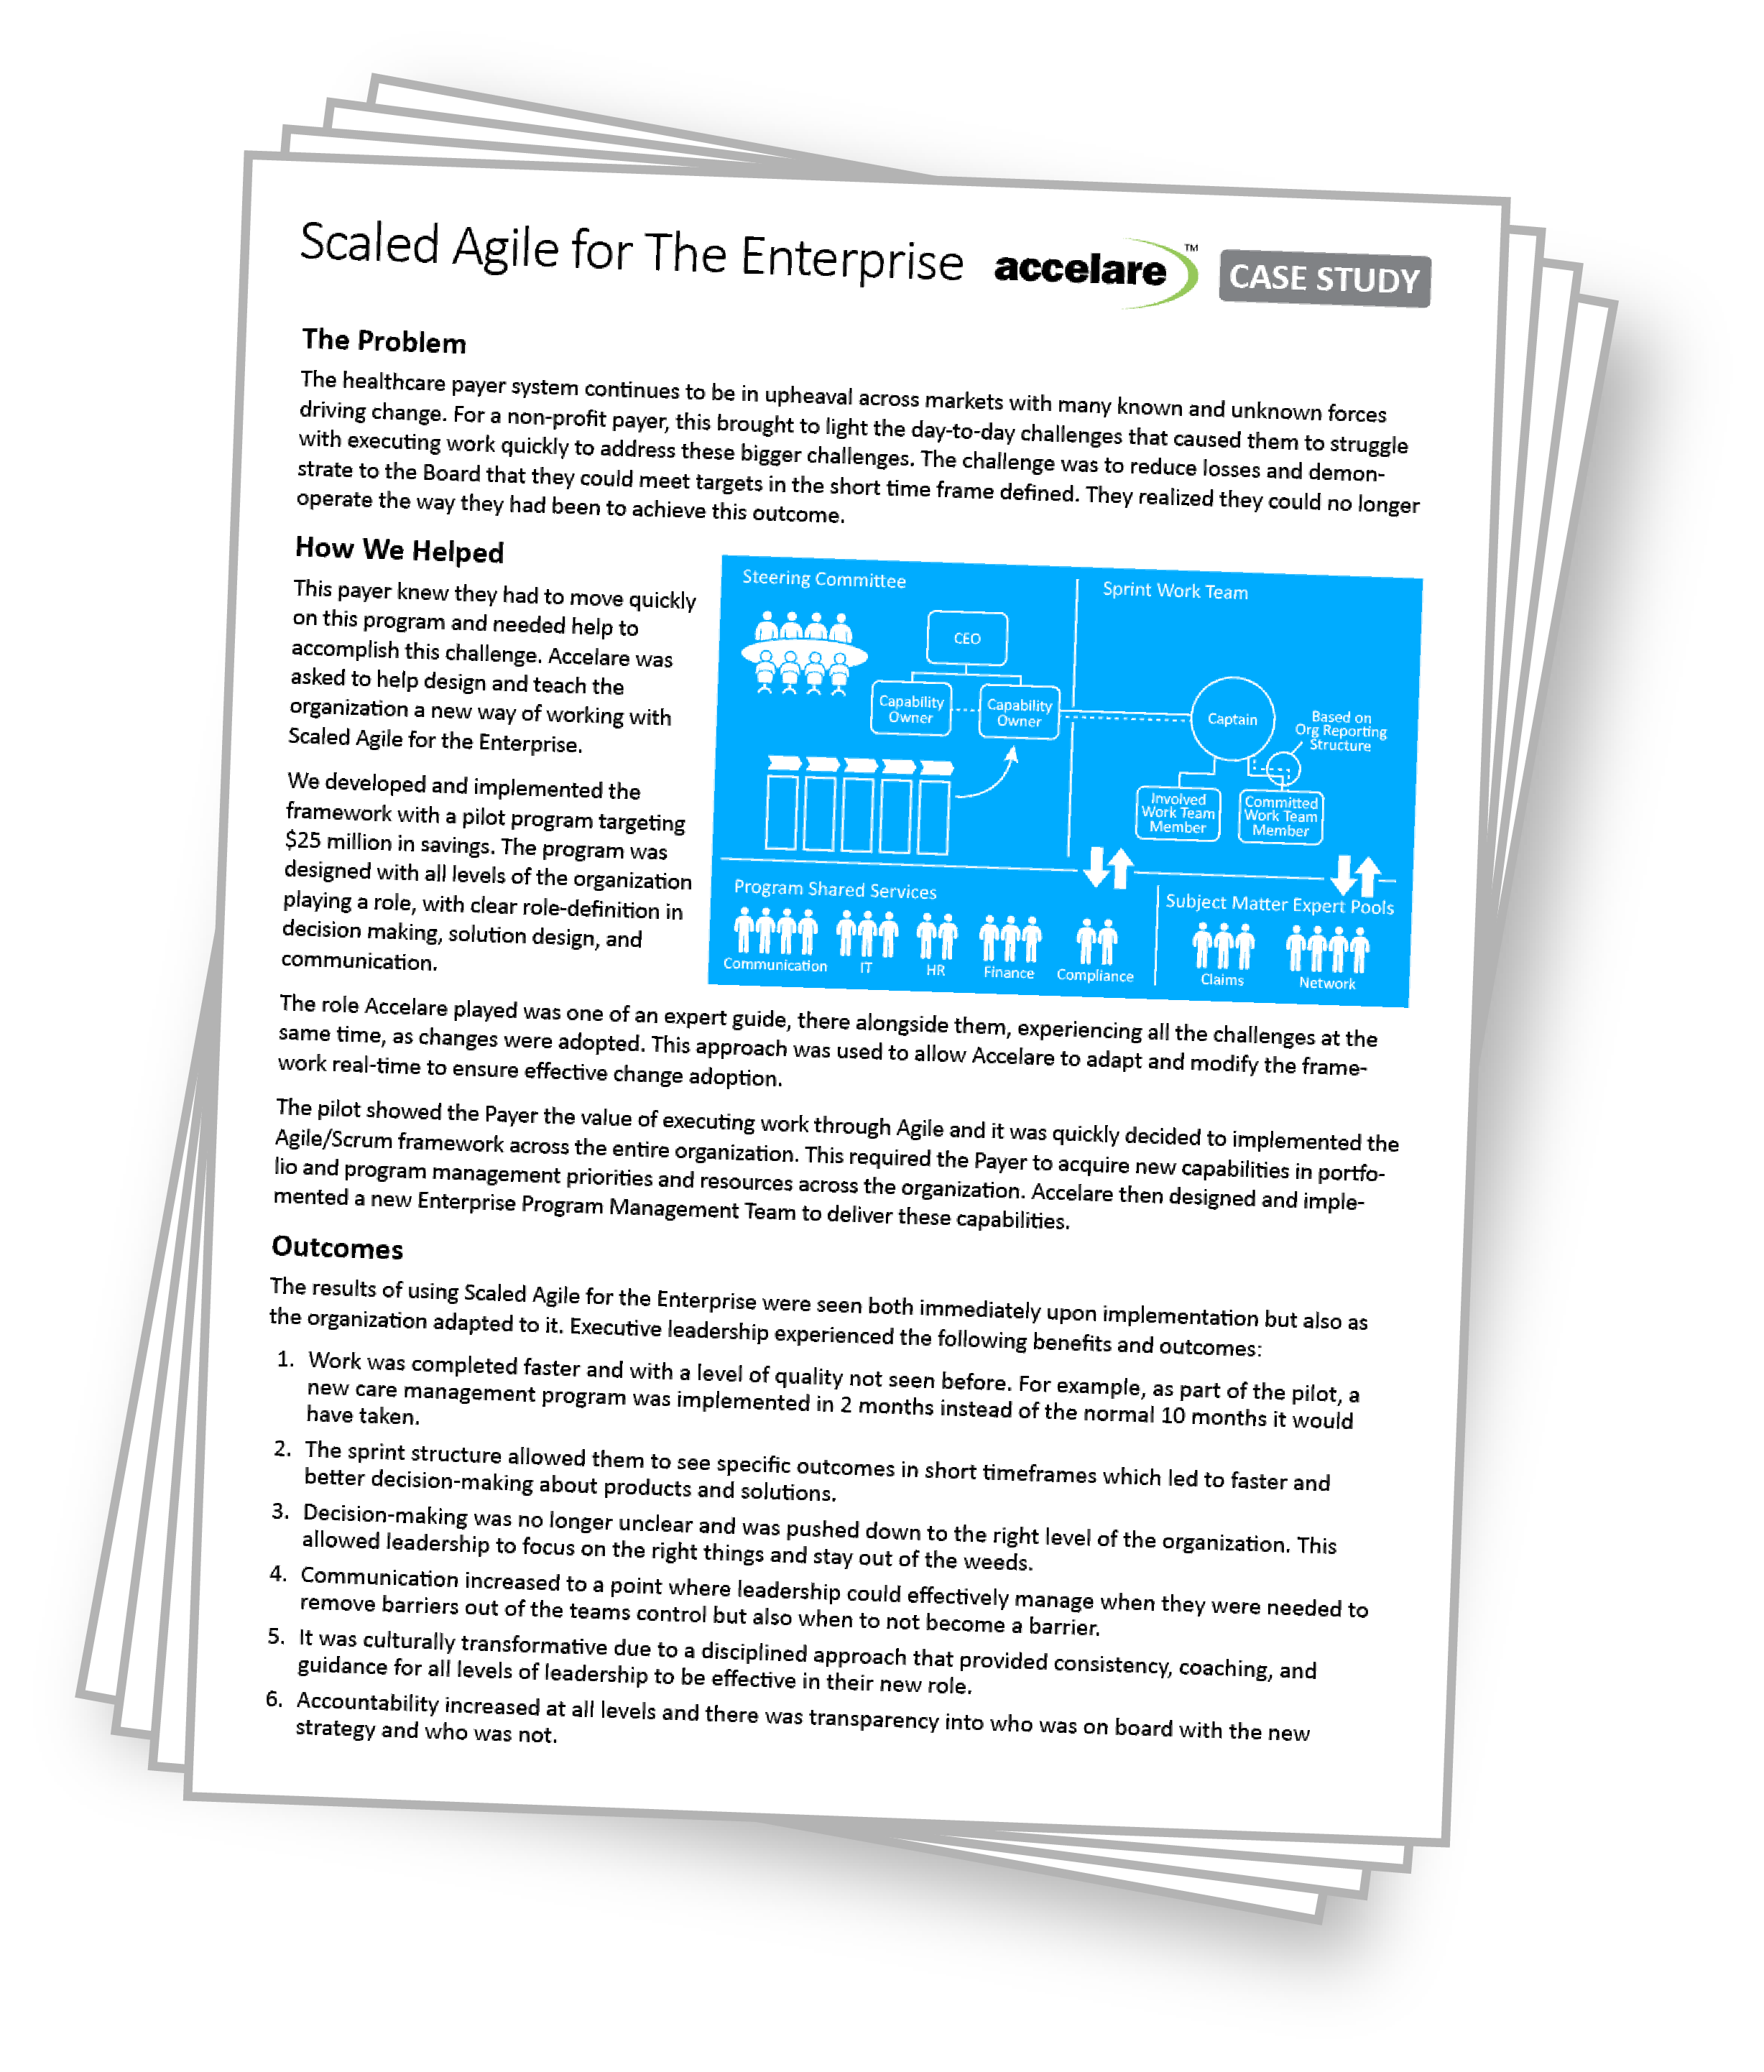 Scaled Agile for the Enterprise